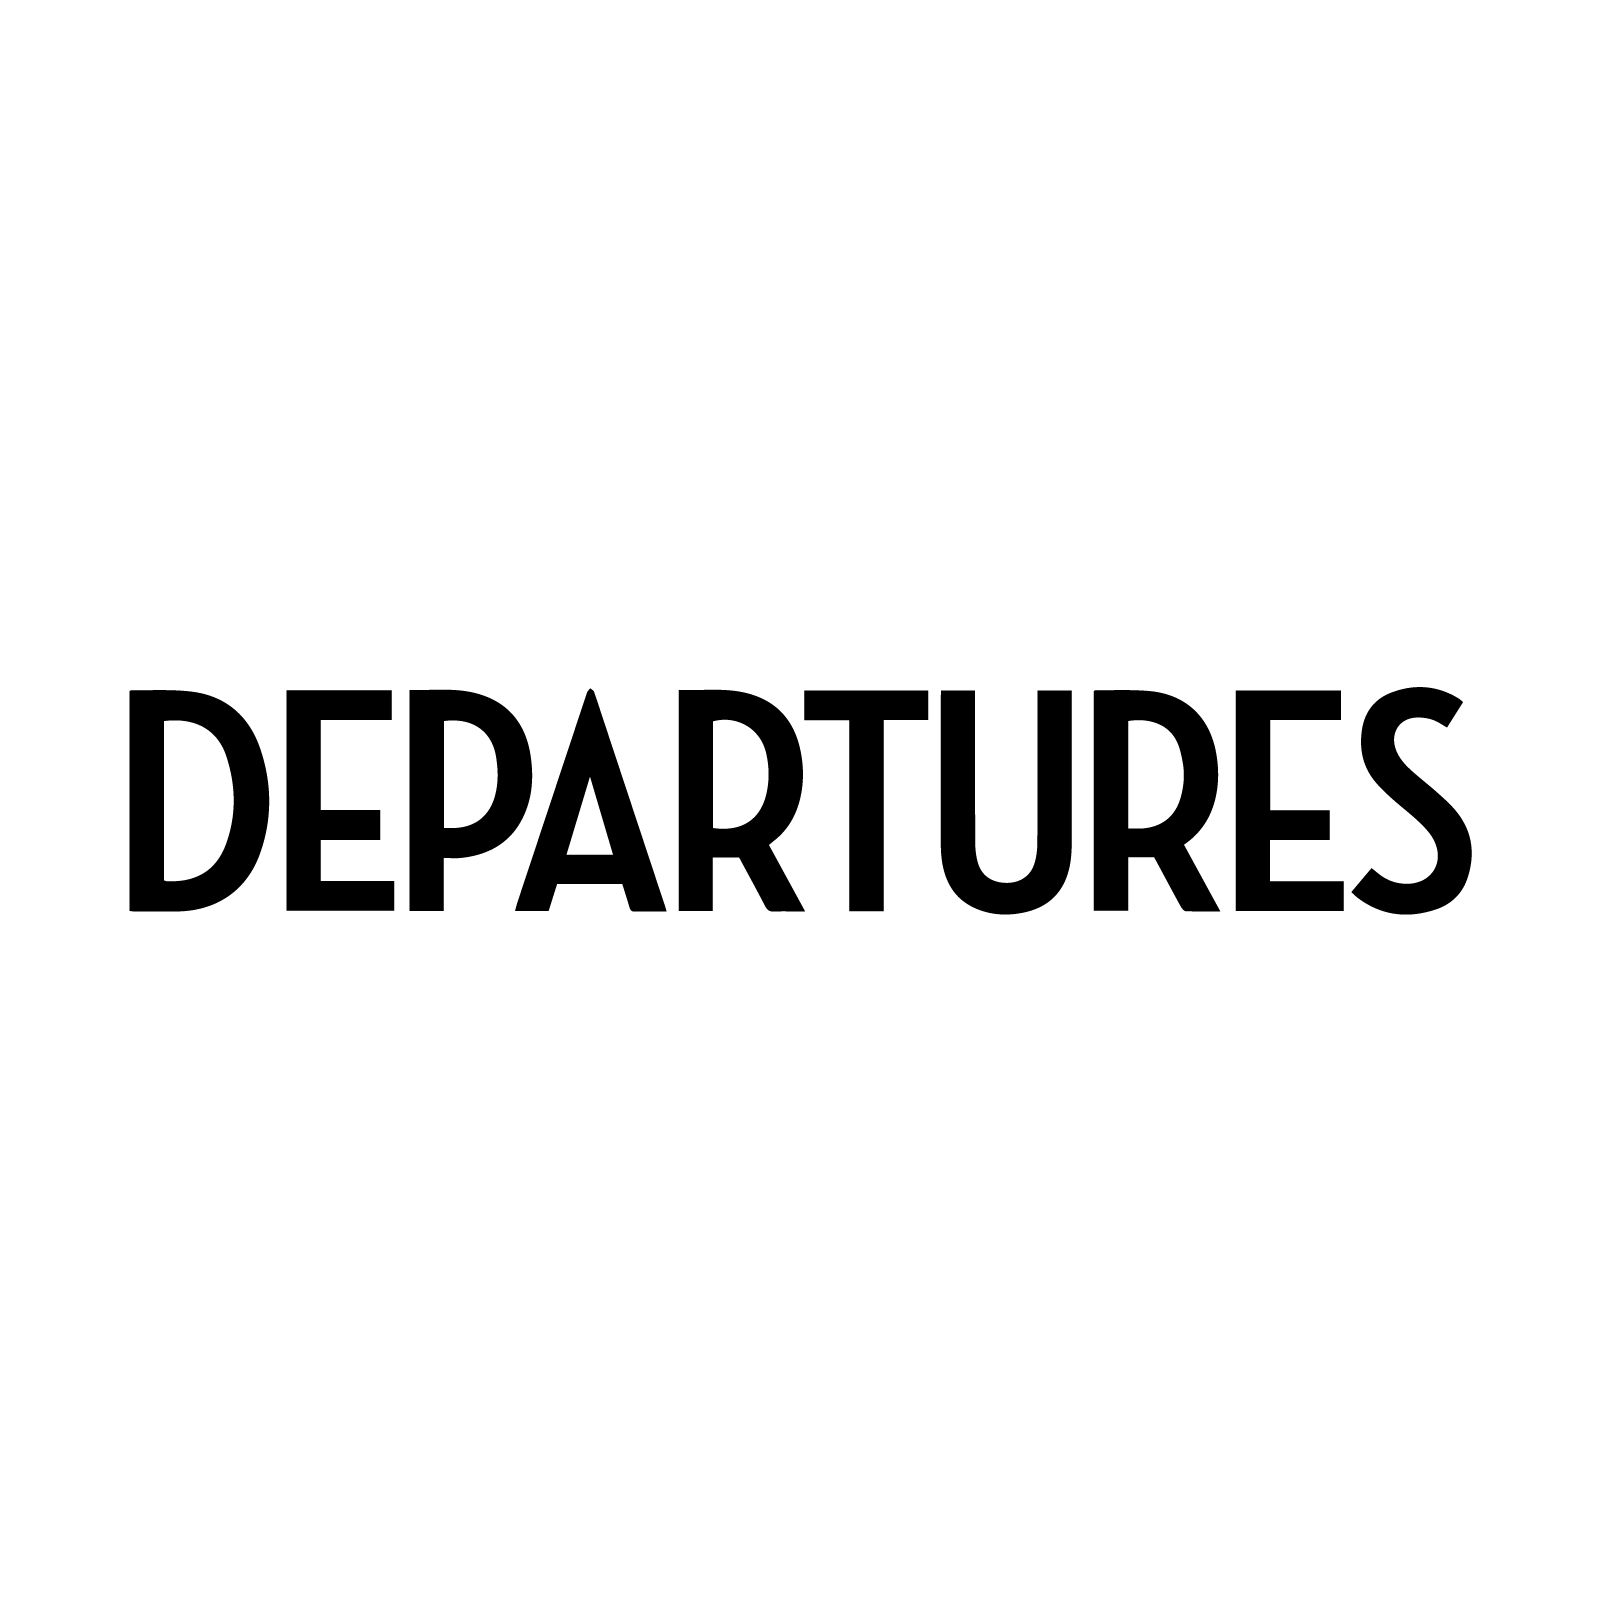 Press Logos_Departures.png